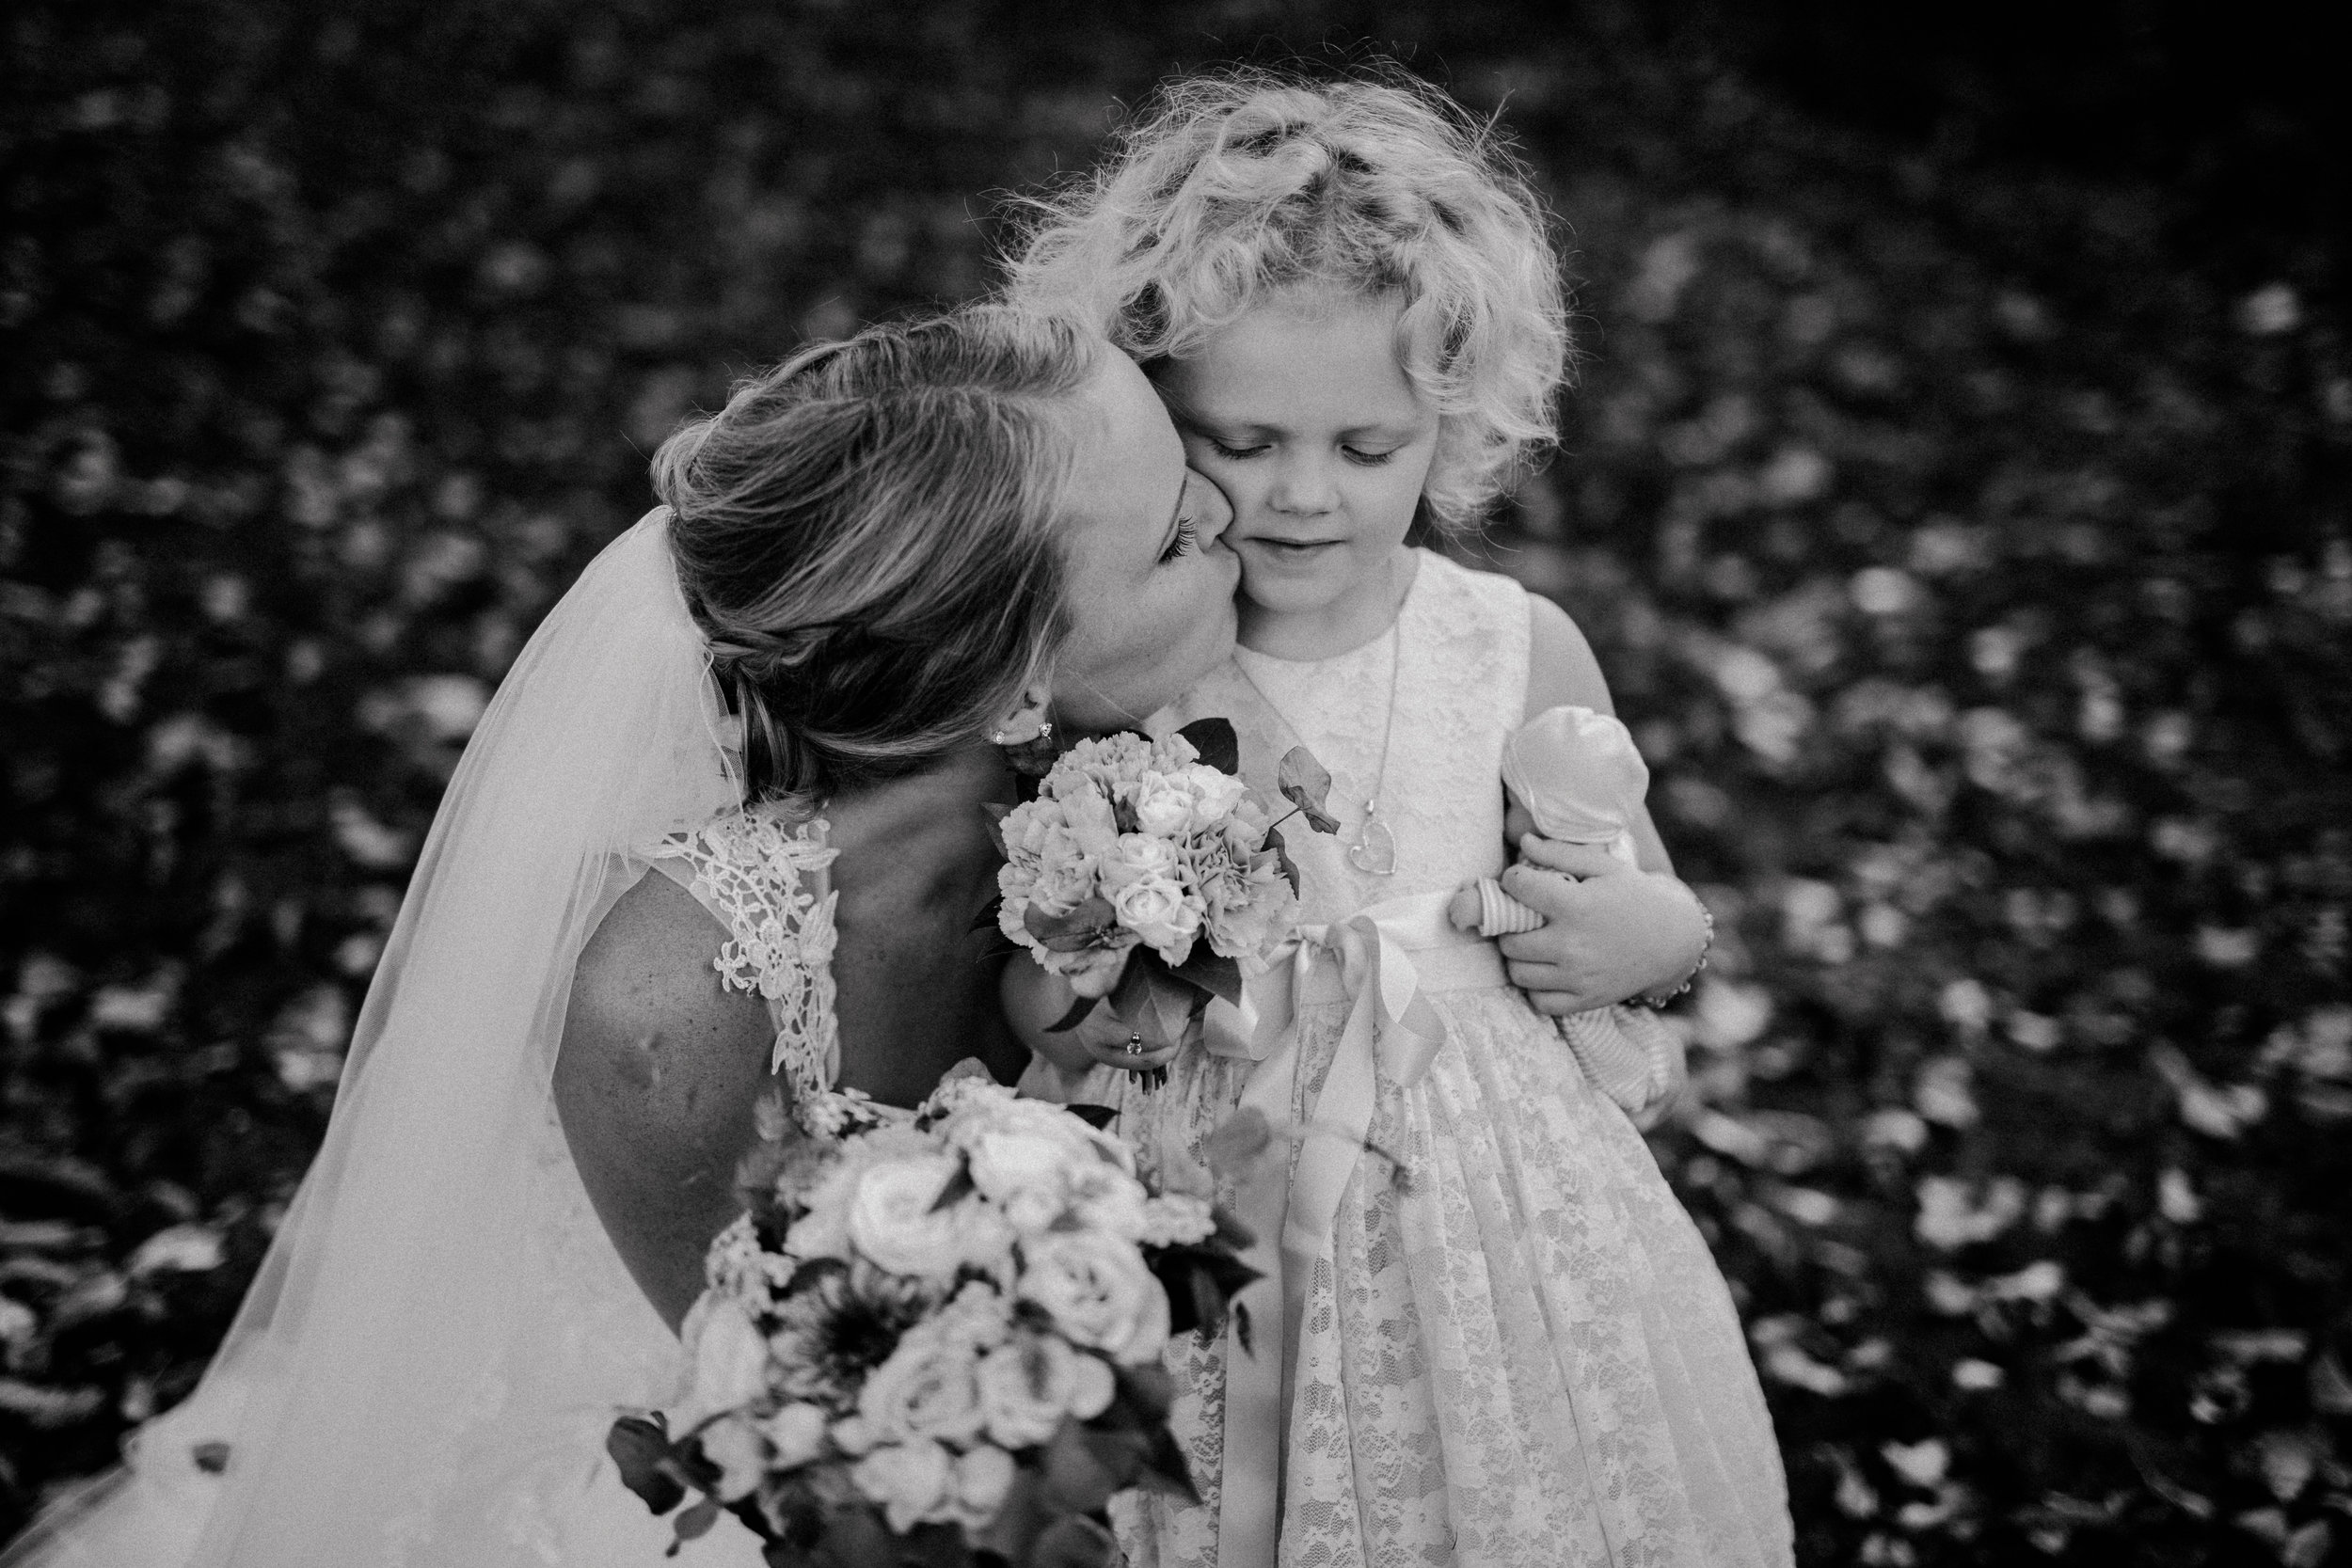 Bröllopsfotograf-Uddetorp Säteri-Höstbröllop-Fotograf Emilia- Bröllopsfotograf Borås-27.jpg